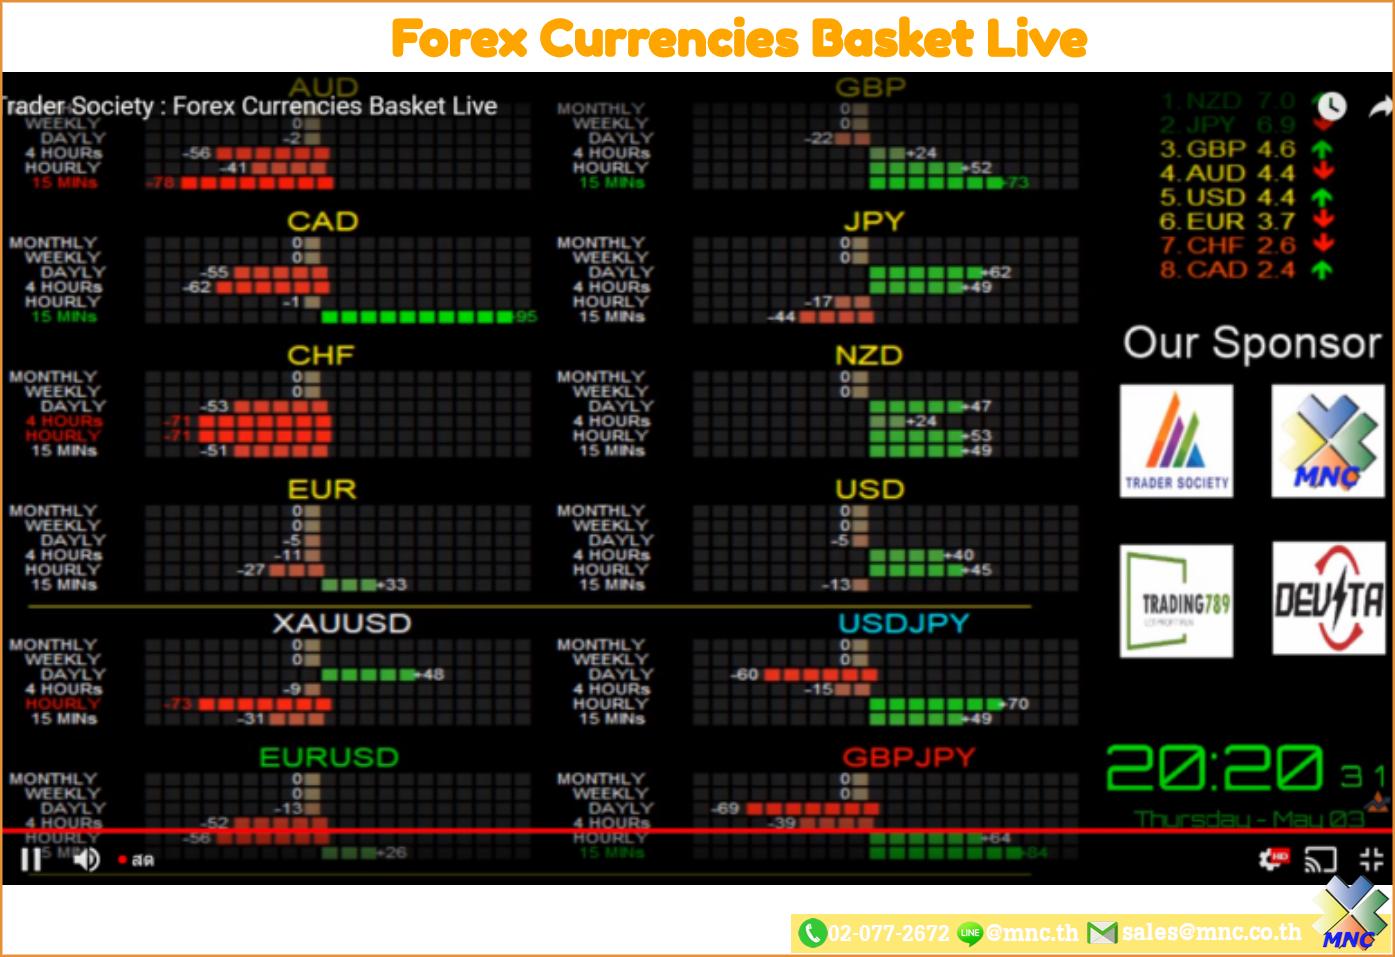 MNC Forex Currencies Basket Live